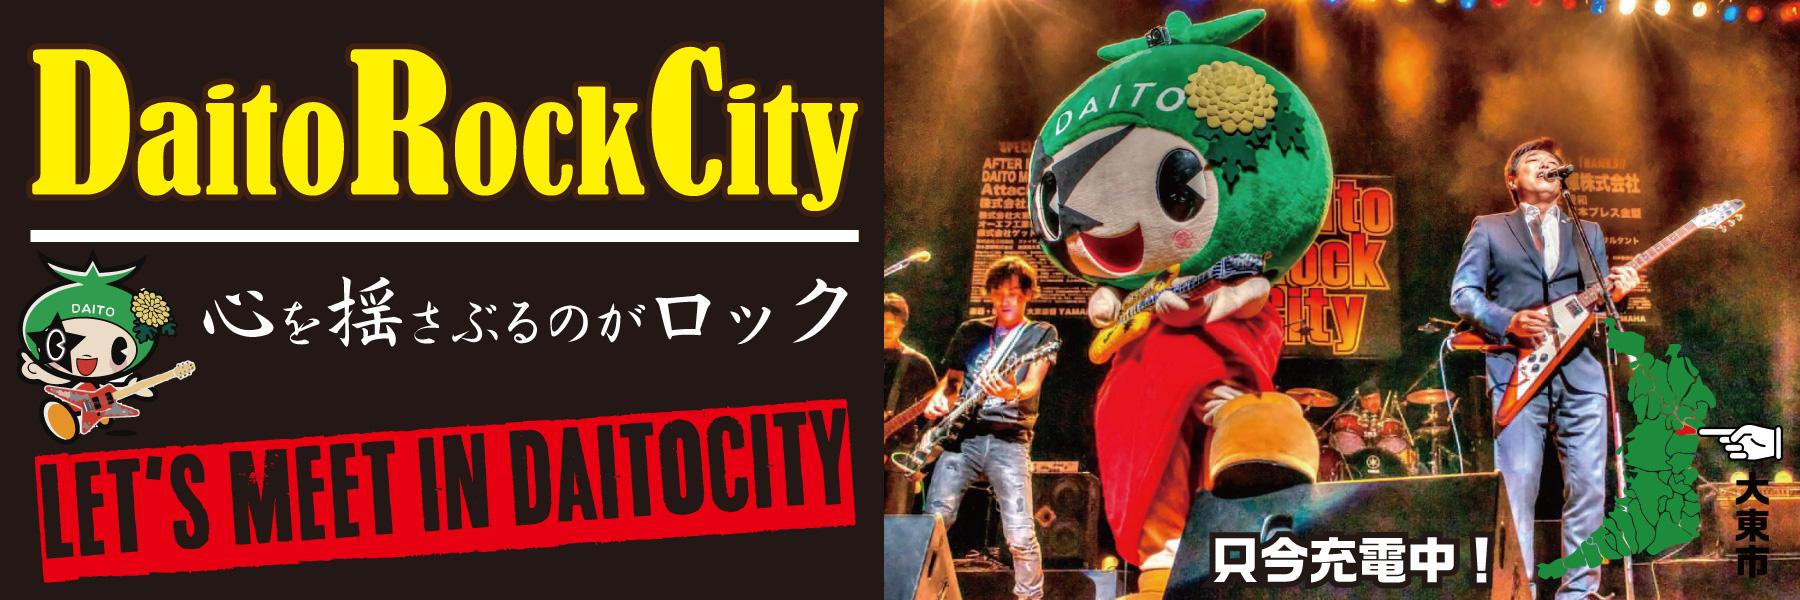 DaitoRockCity